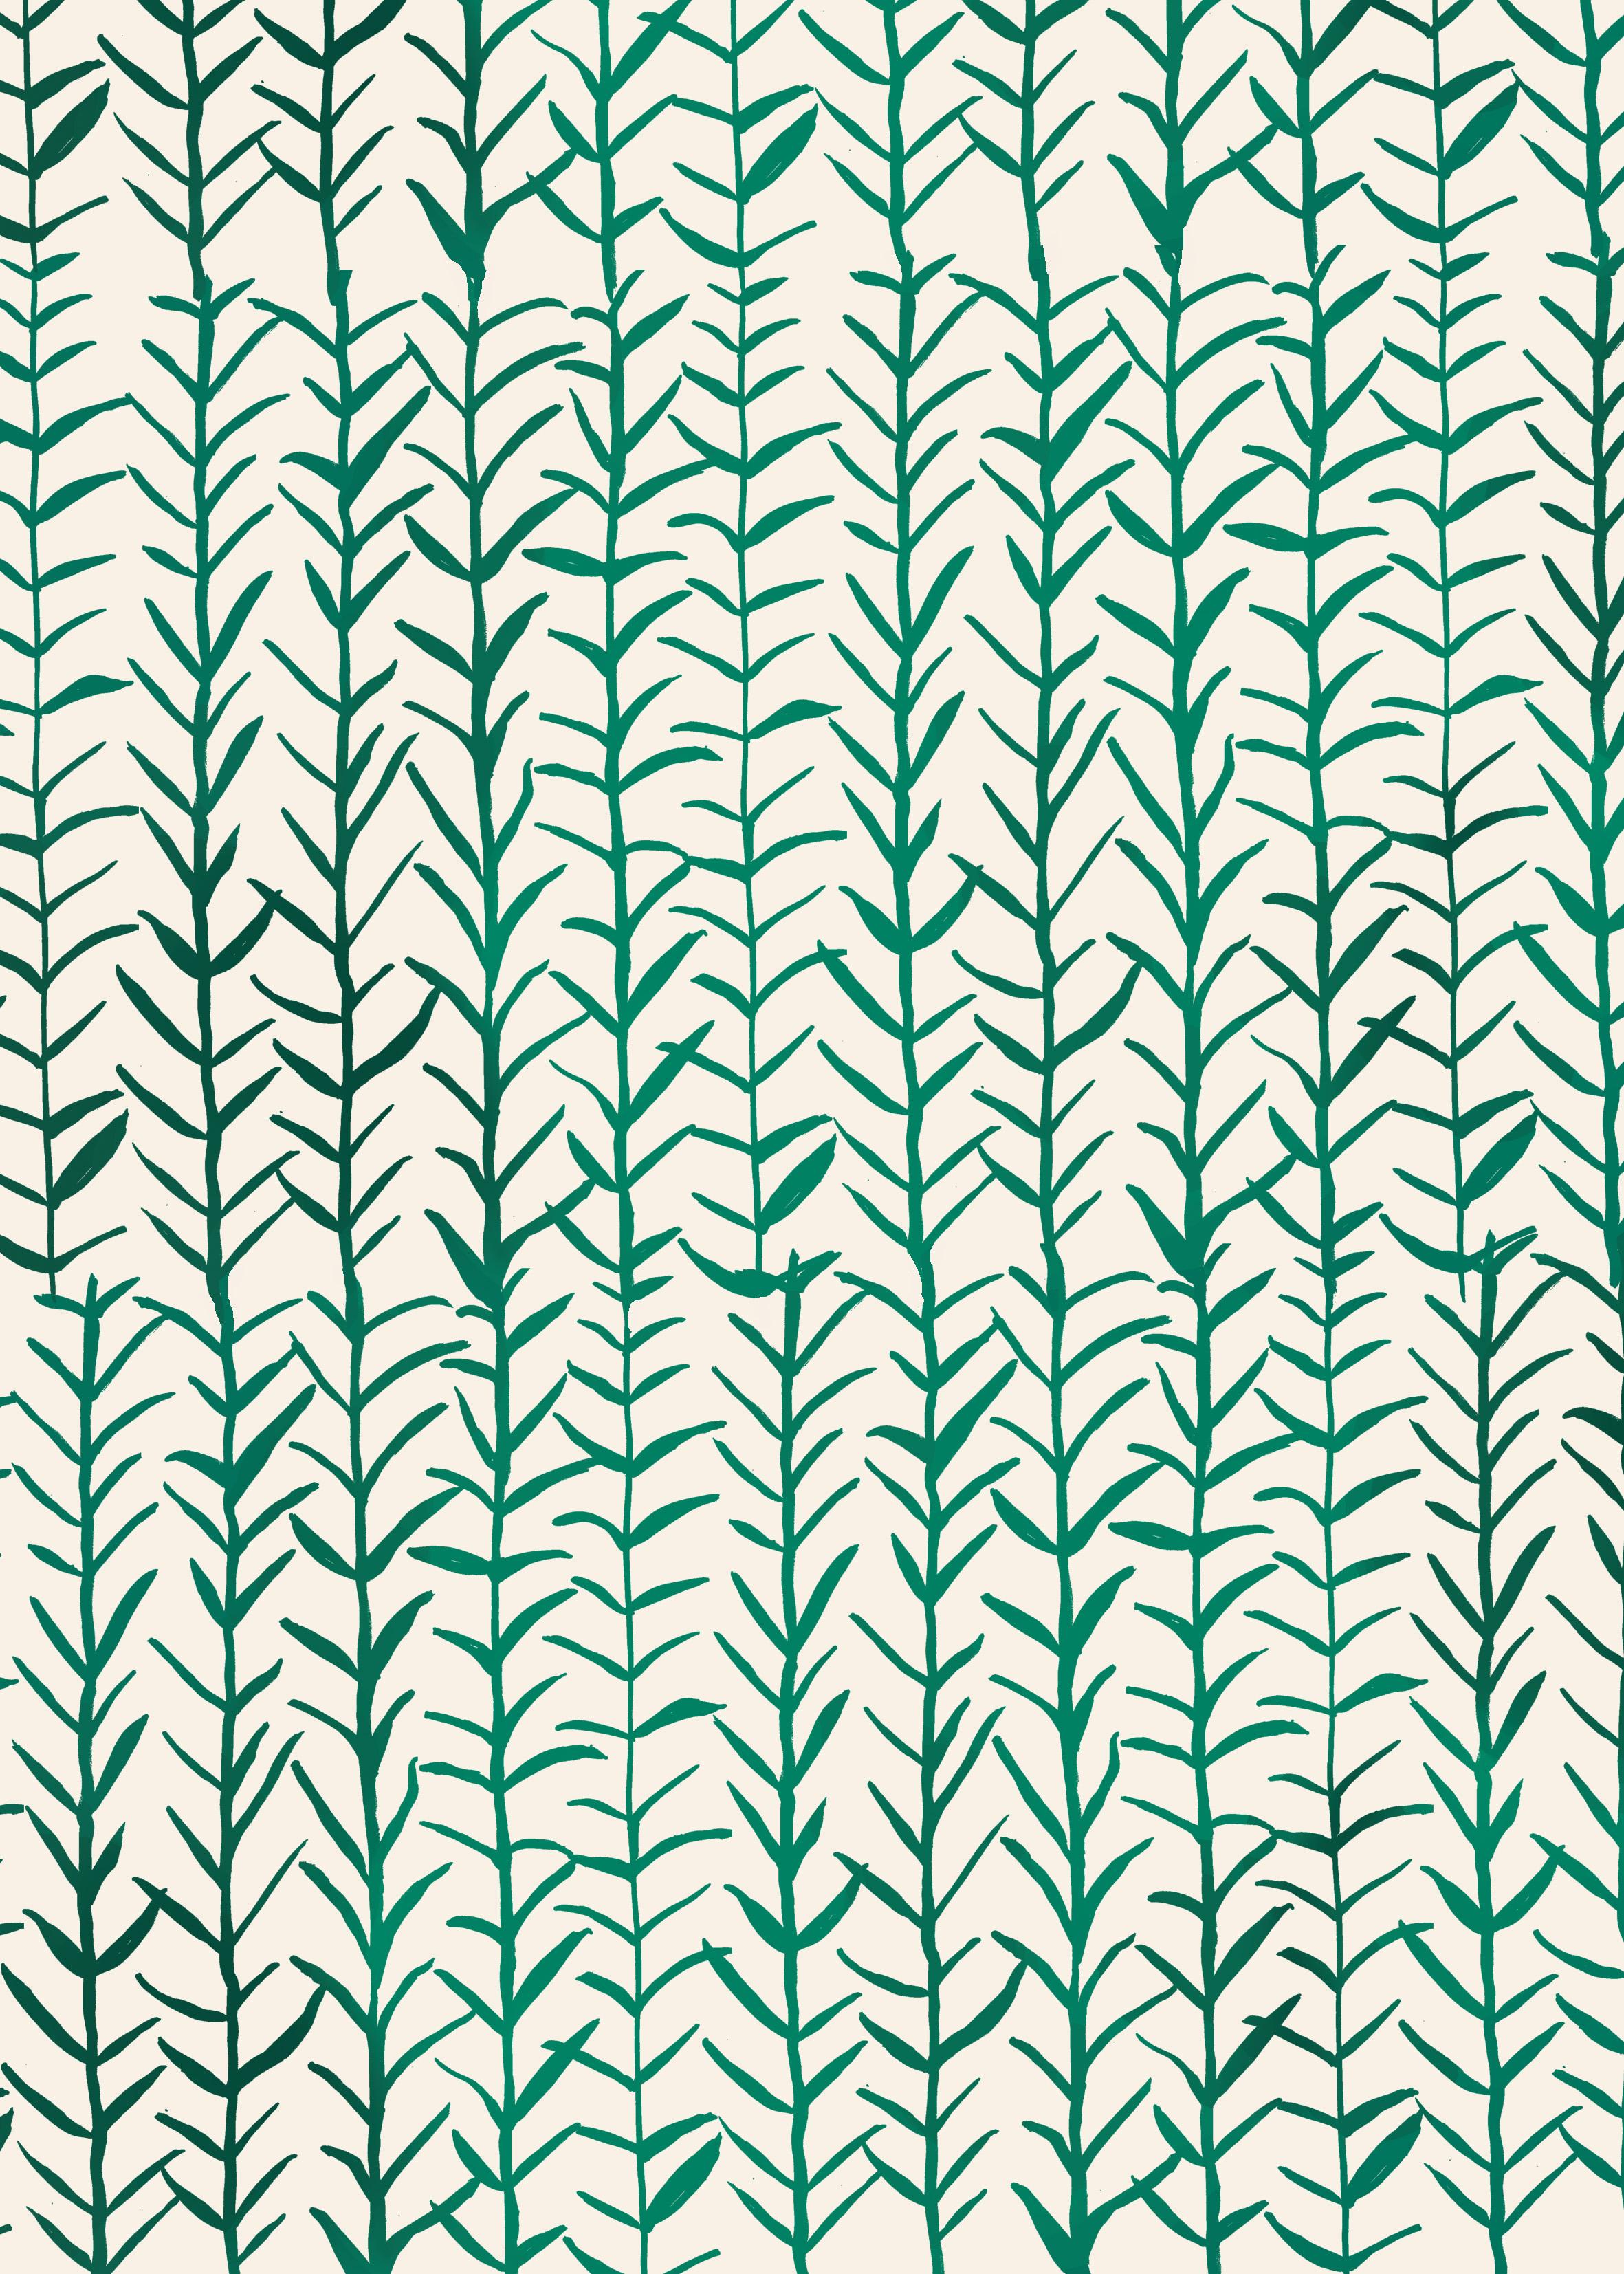 HelloMarine-pattern5.jpg